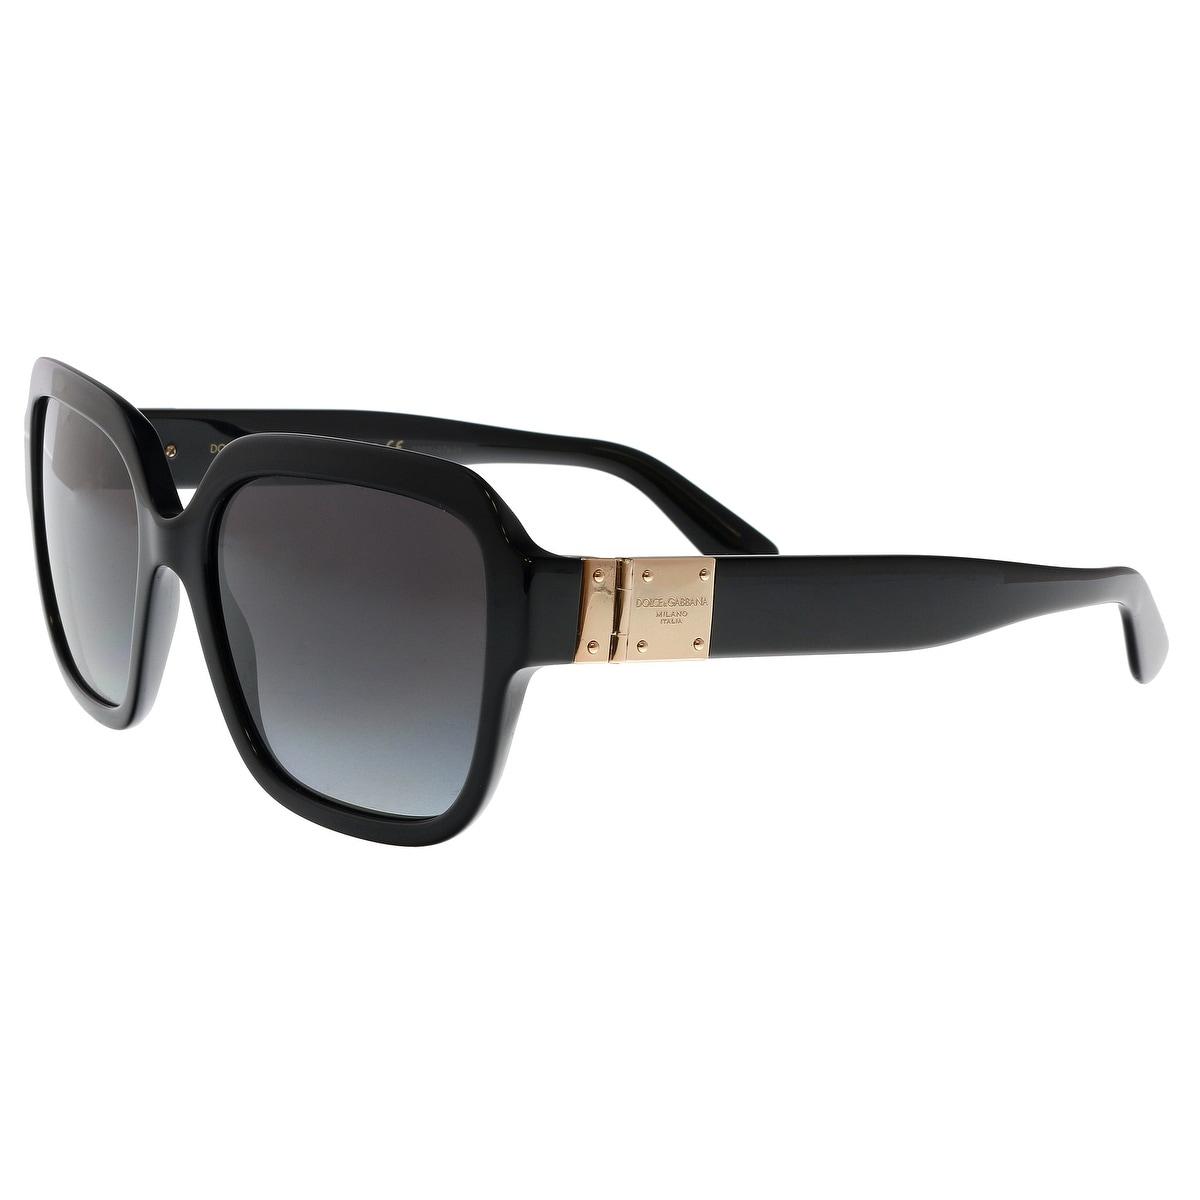 94248ee2df93 Dolce   Gabbana Women s Sunglasses